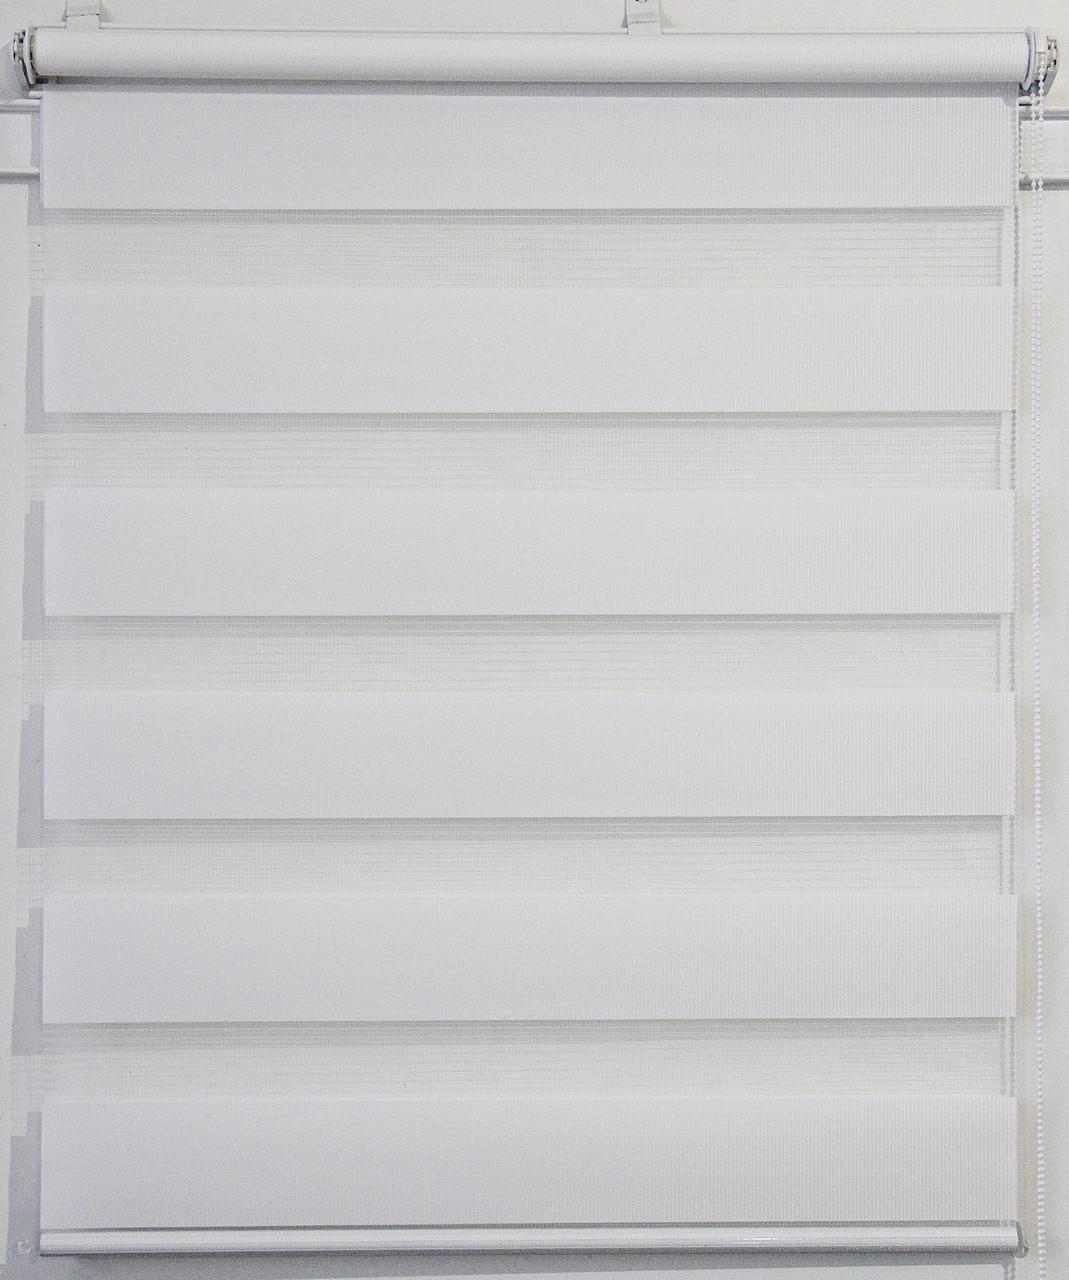 Рулонная штора 450*1300 ВН-01 Белый